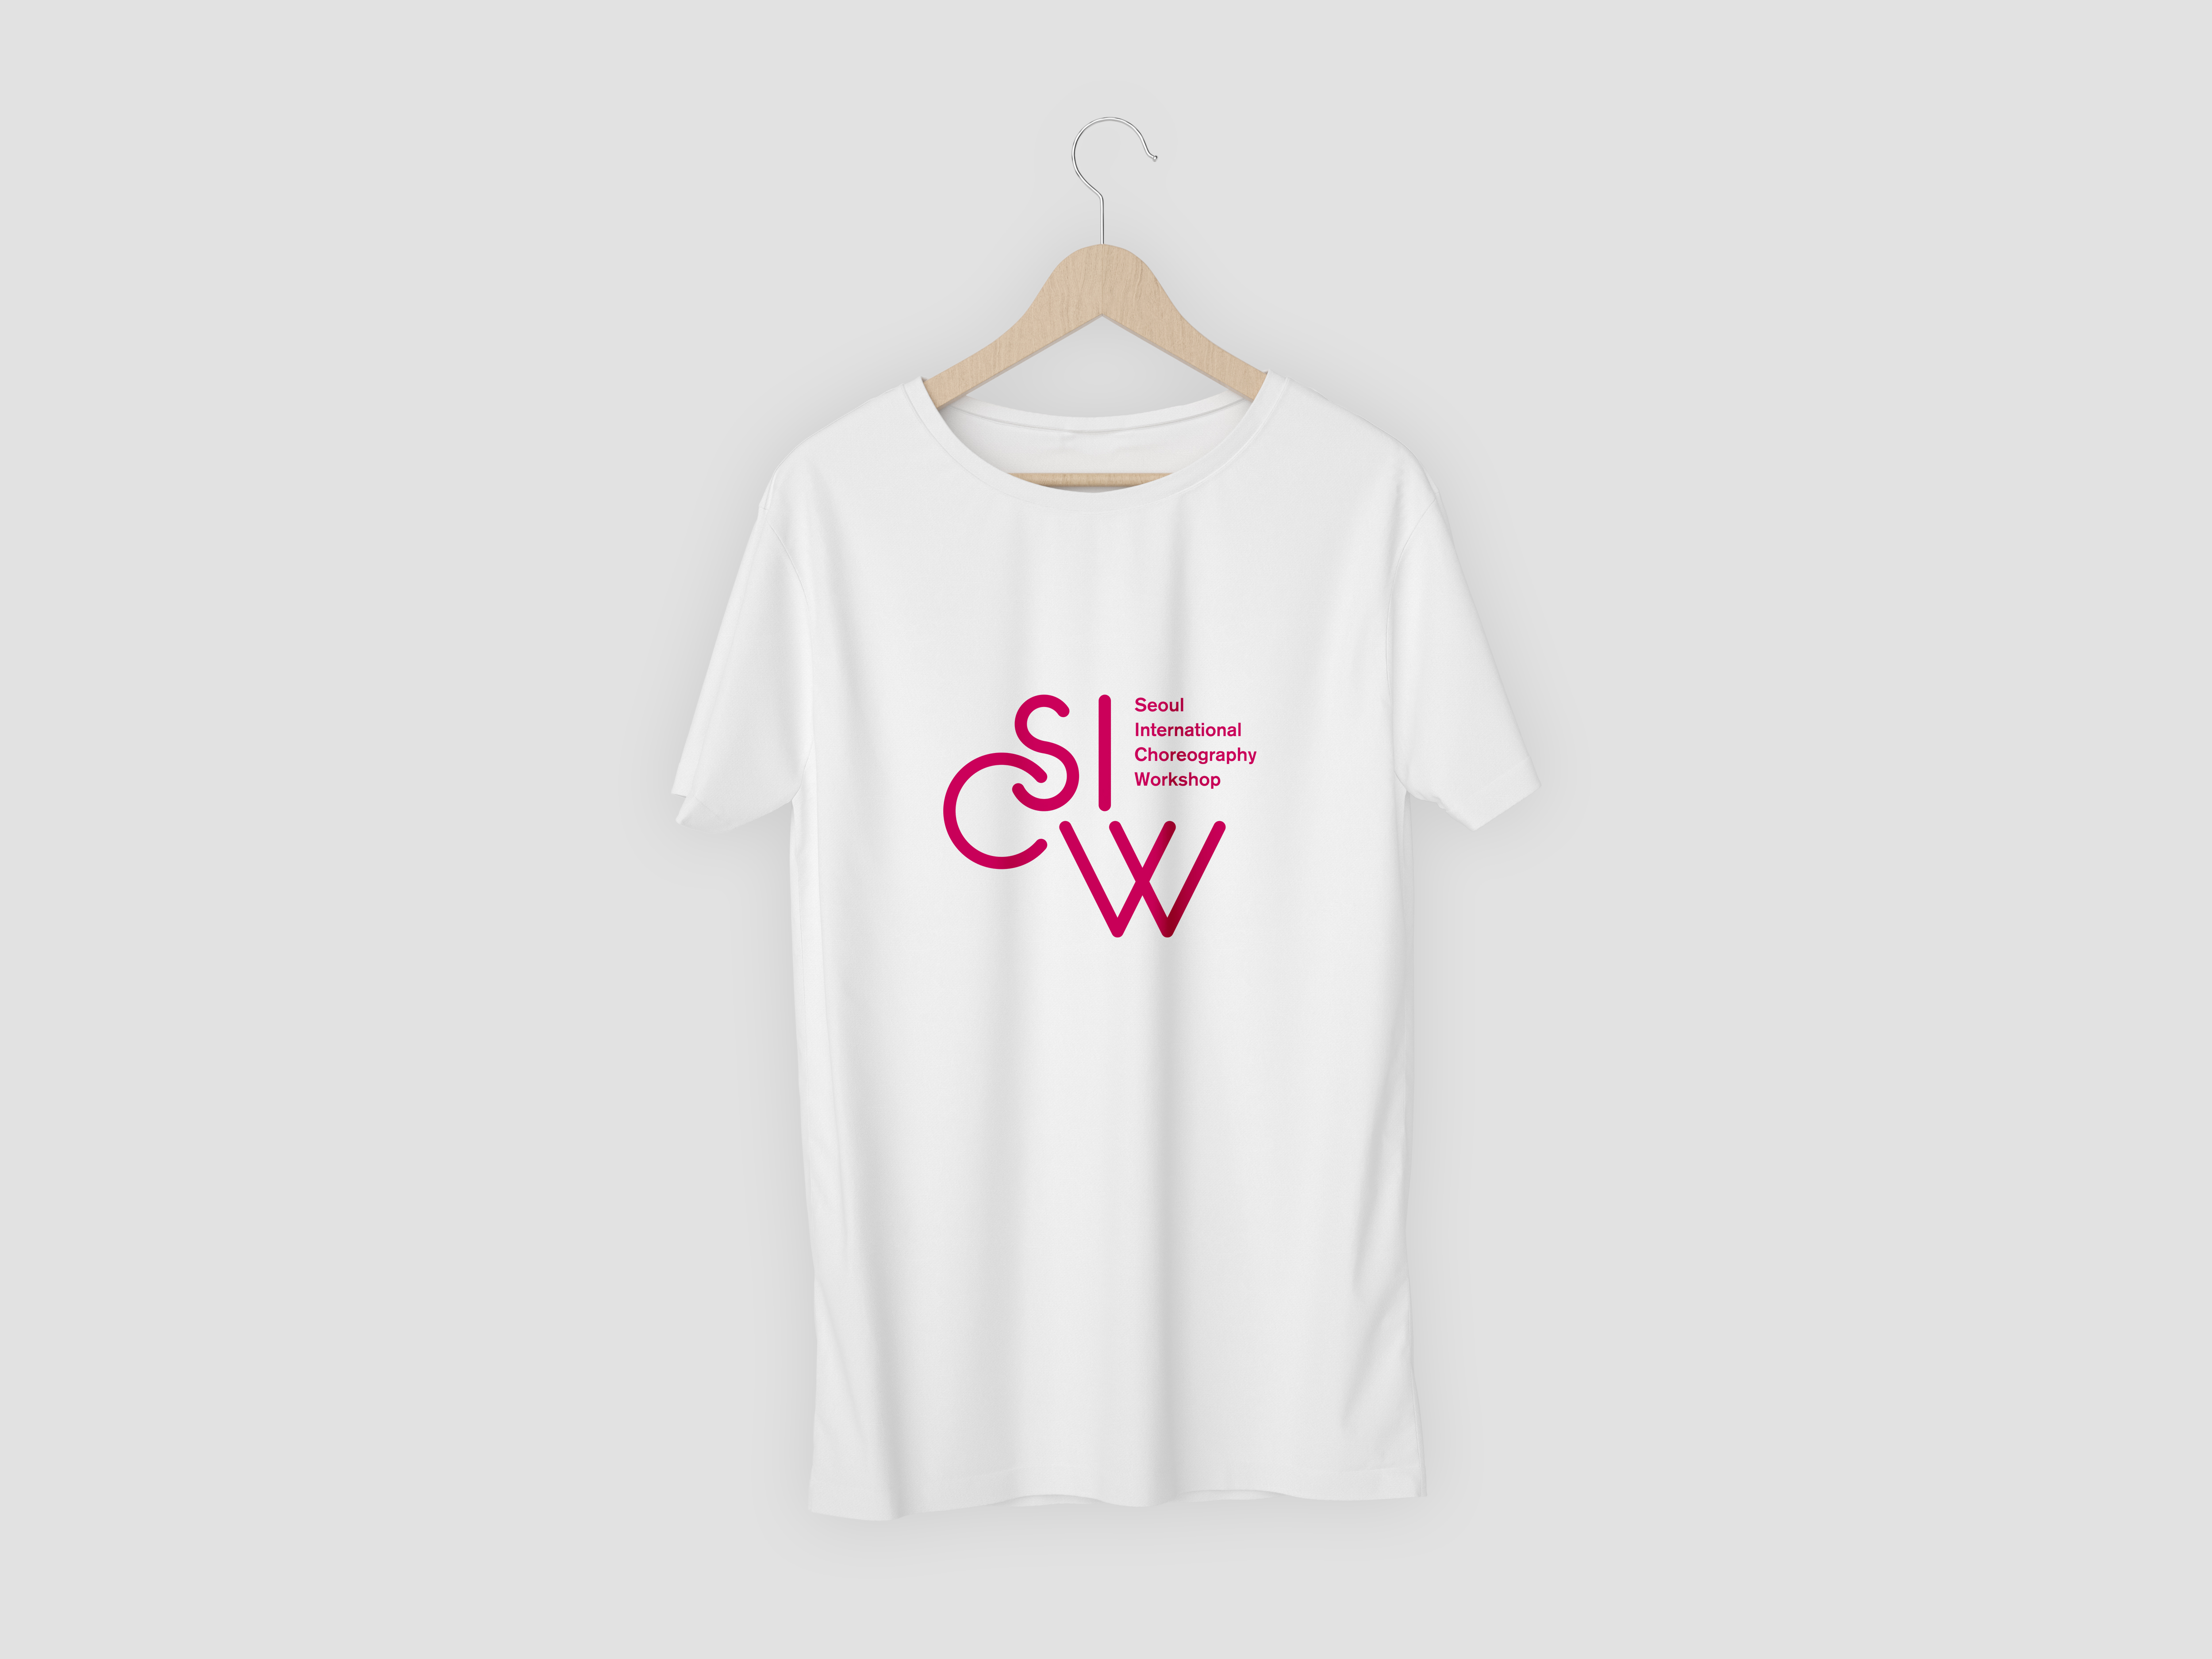 SICW 티셔츠